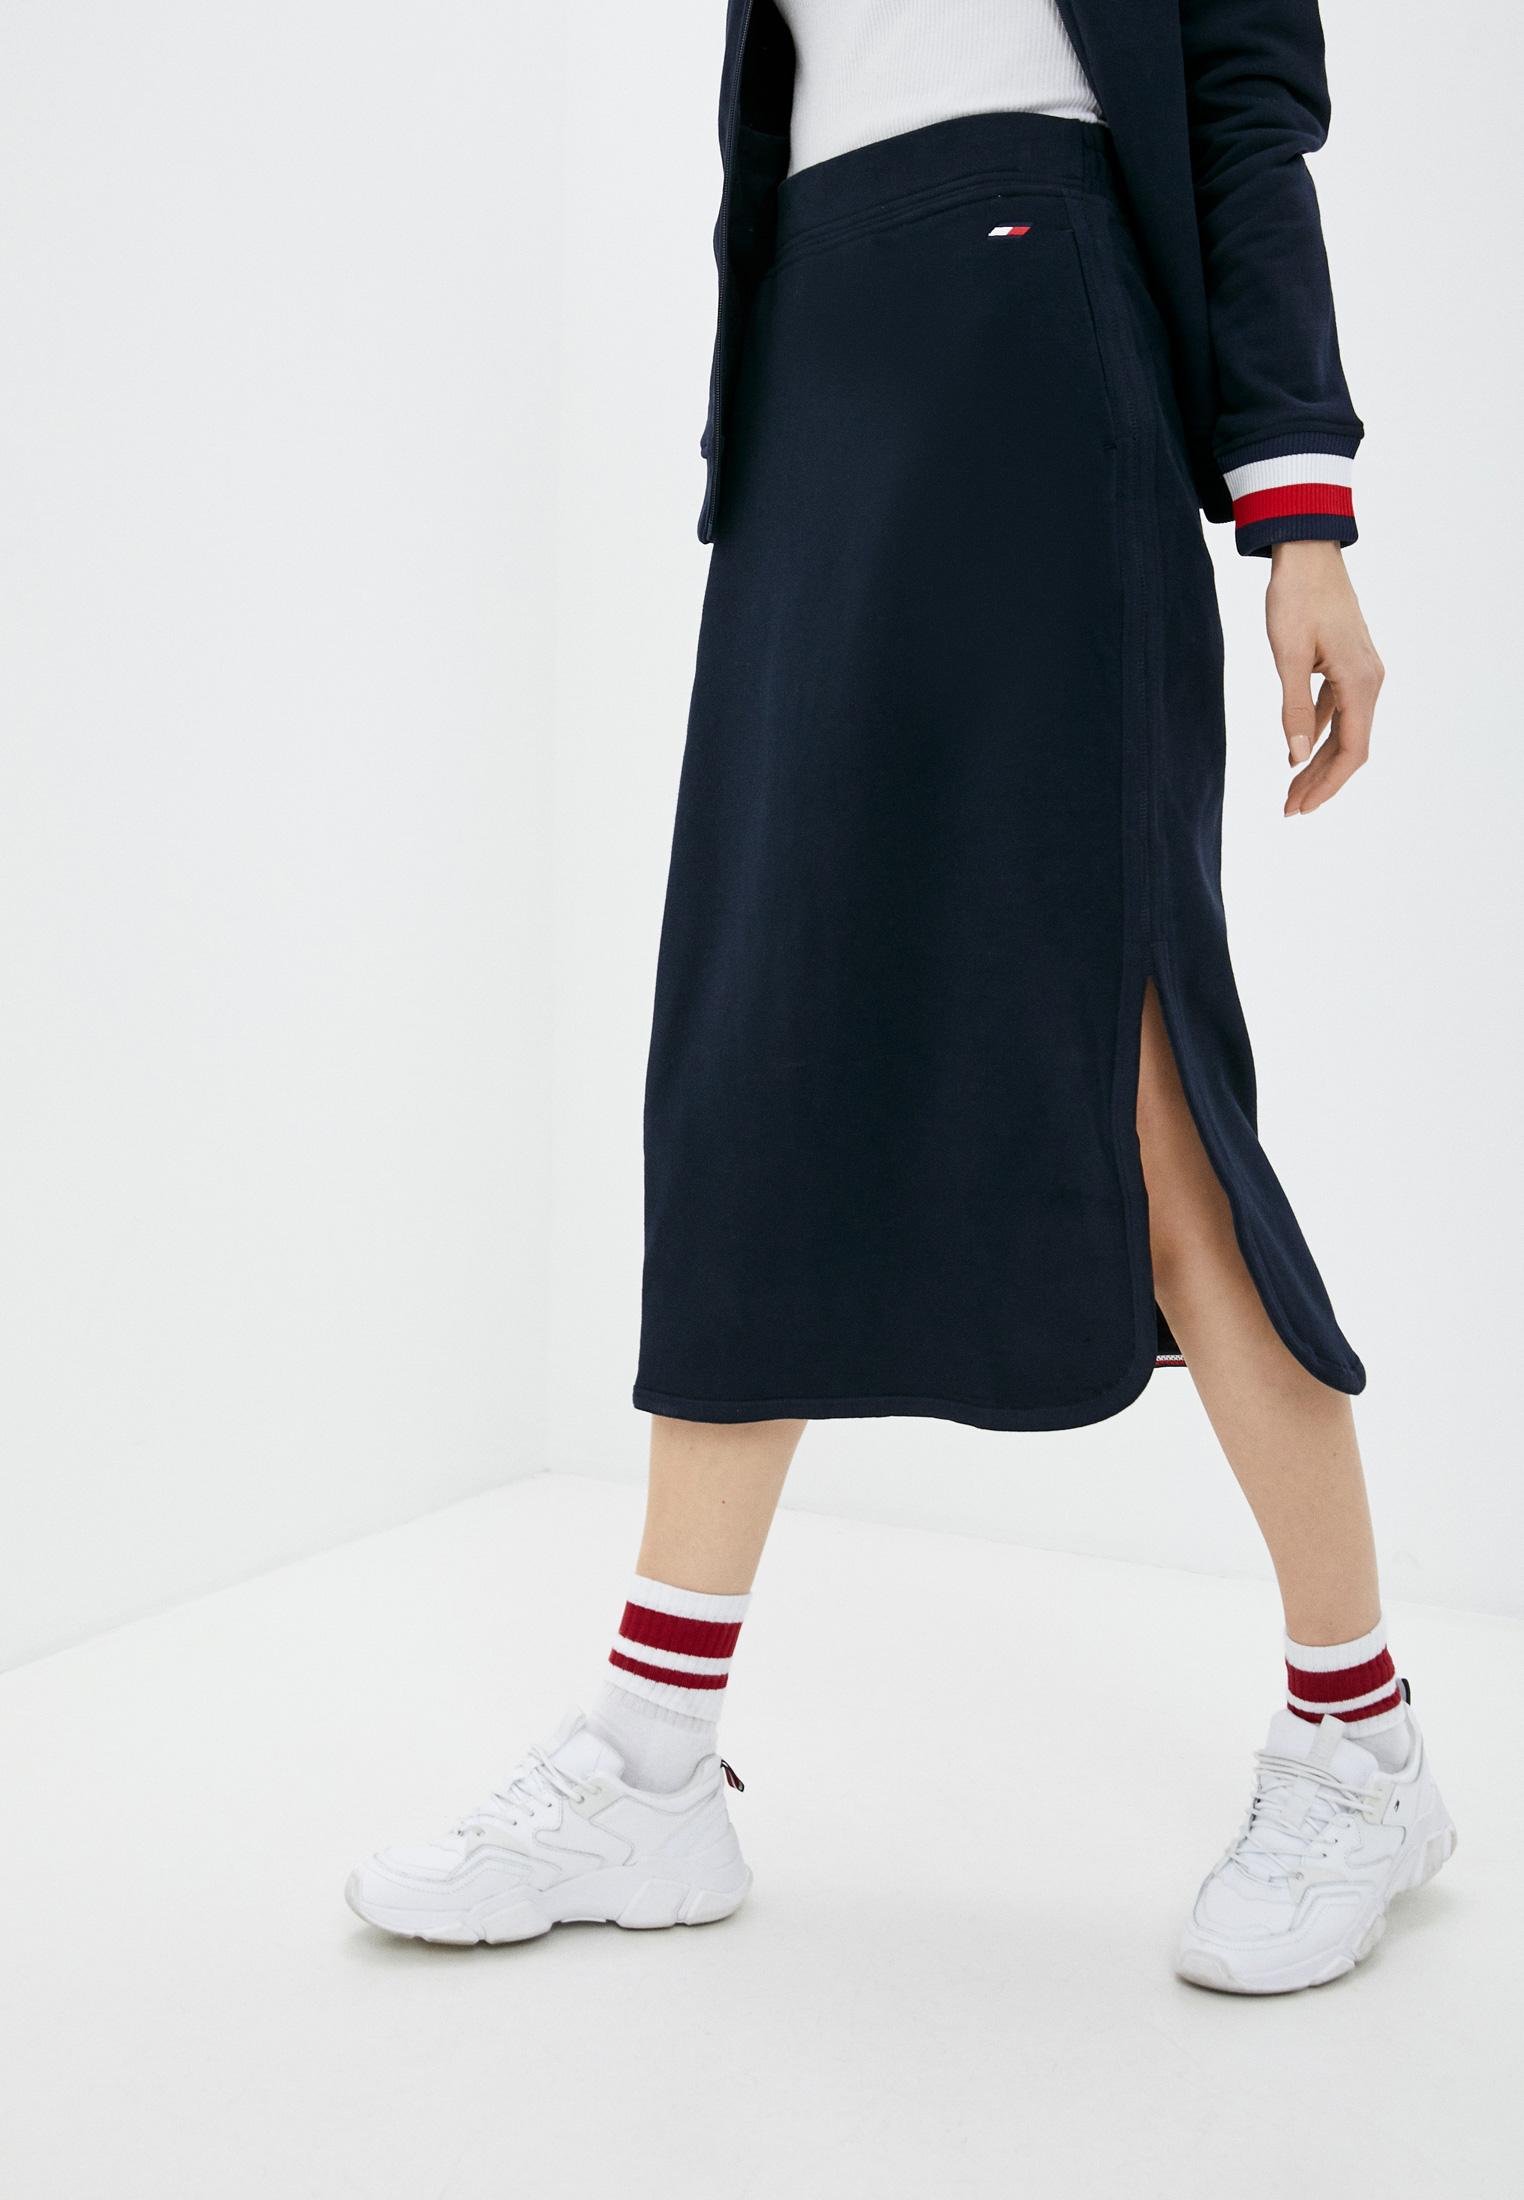 Прямая юбка Tommy Hilfiger (Томми Хилфигер) S10S101025